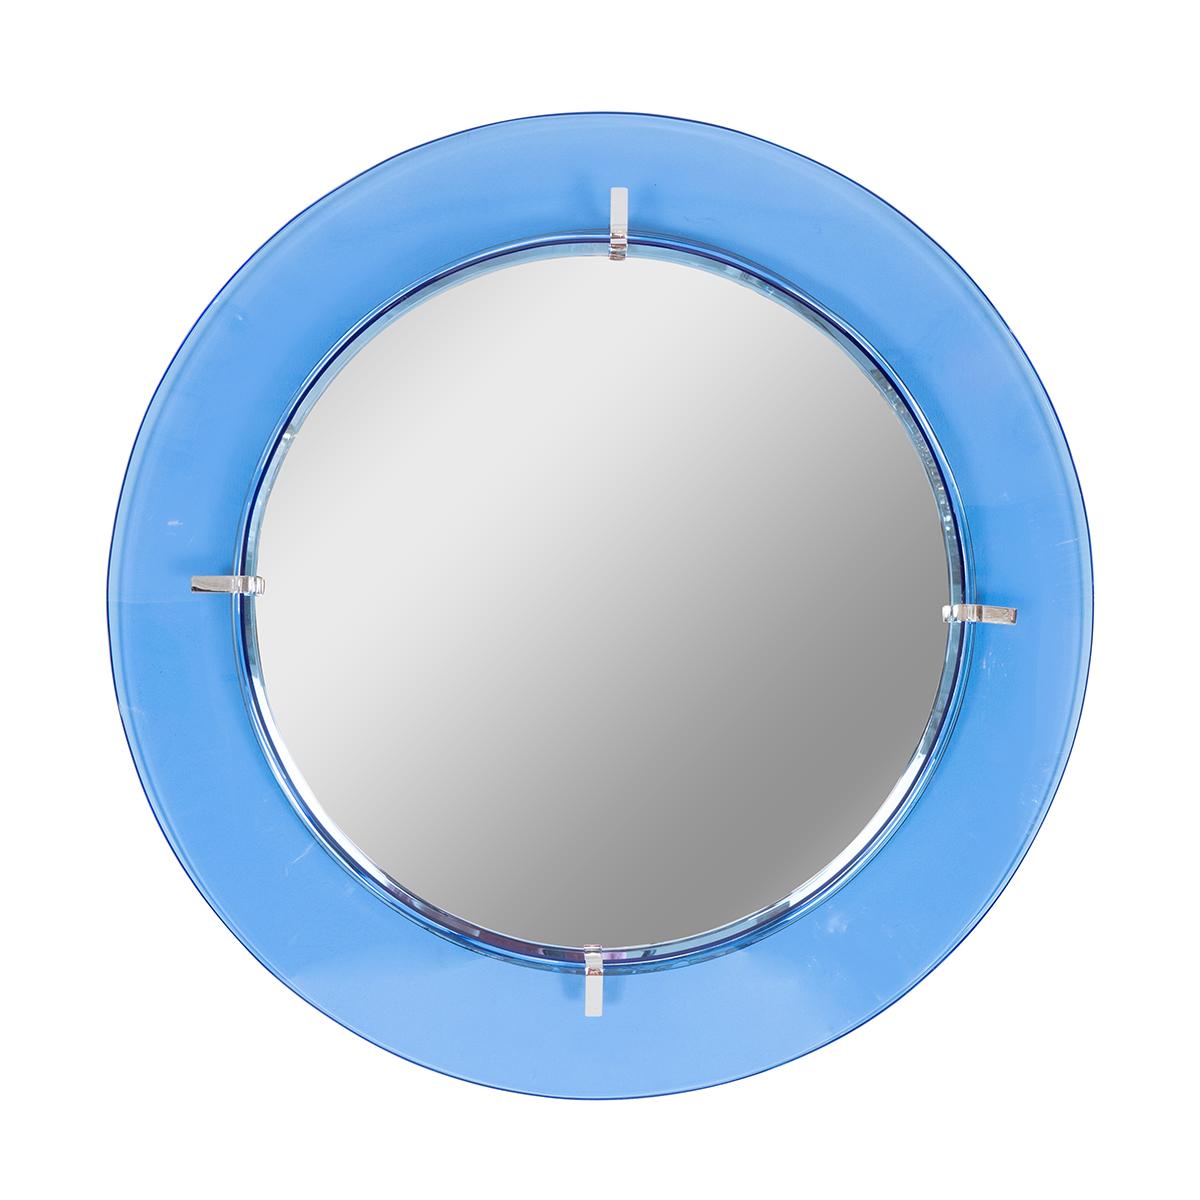 Blue glass surround mirror  2db59b46a51